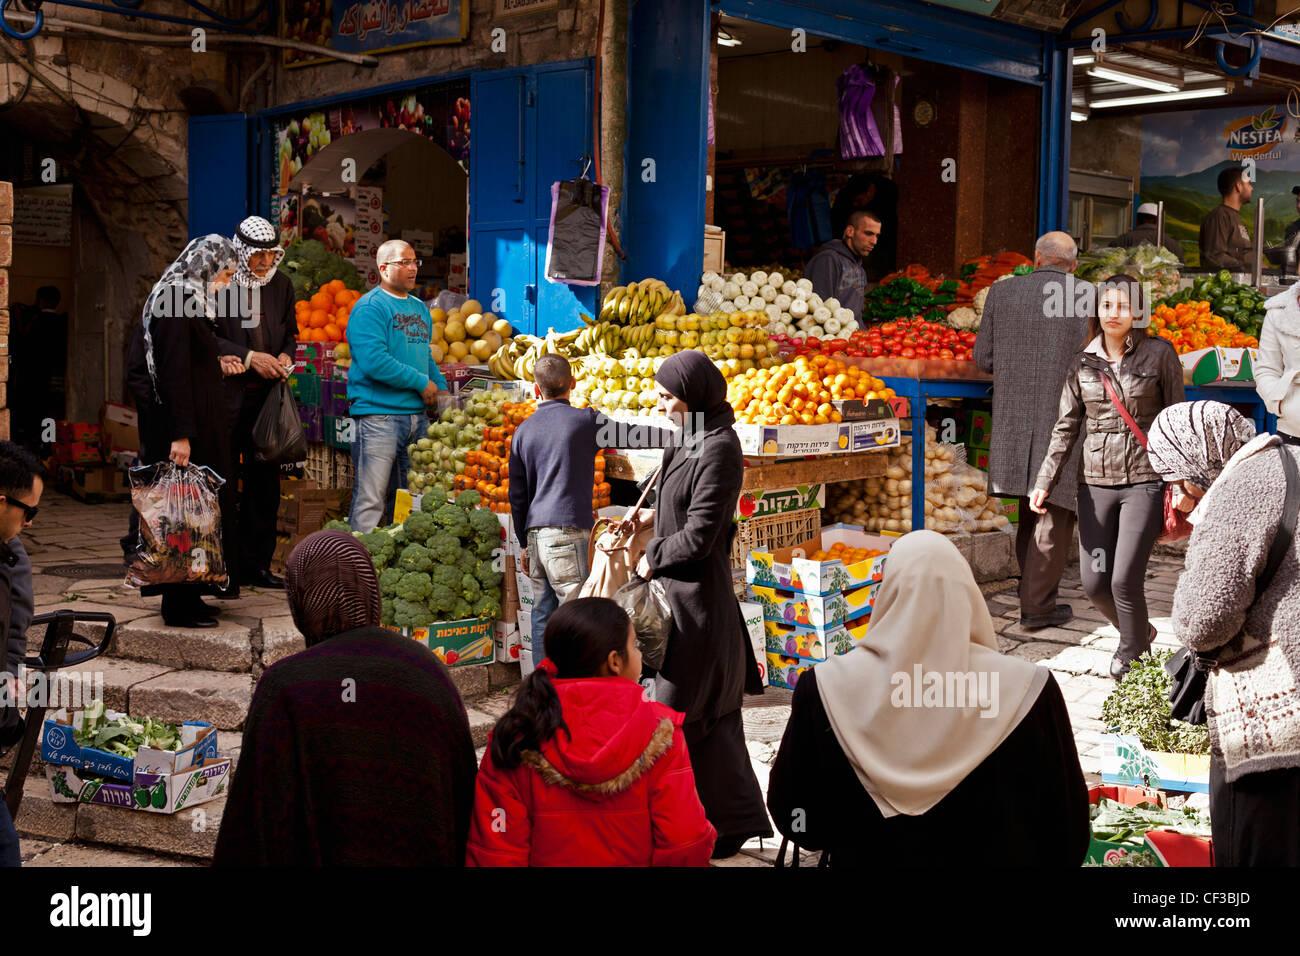 Israel,Jerusalem, Arab Quarter or Muslim Quarter, open air fruit and vegetable market Stock Photo